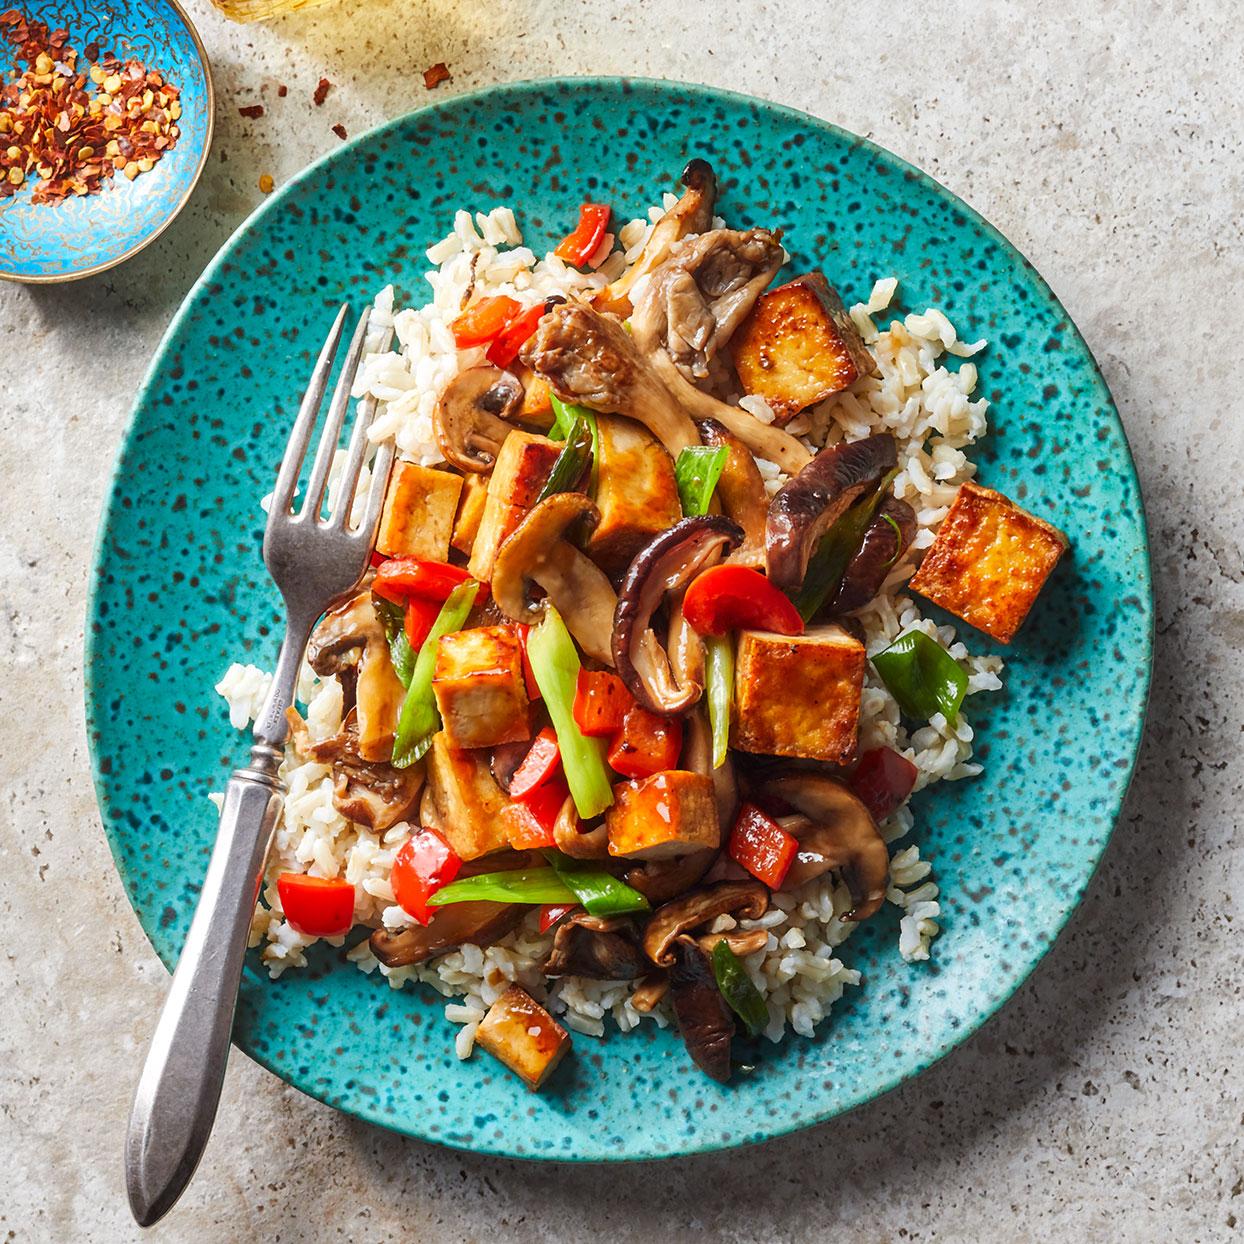 Mushroom & Tofu Stir-Fry Trusted Brands